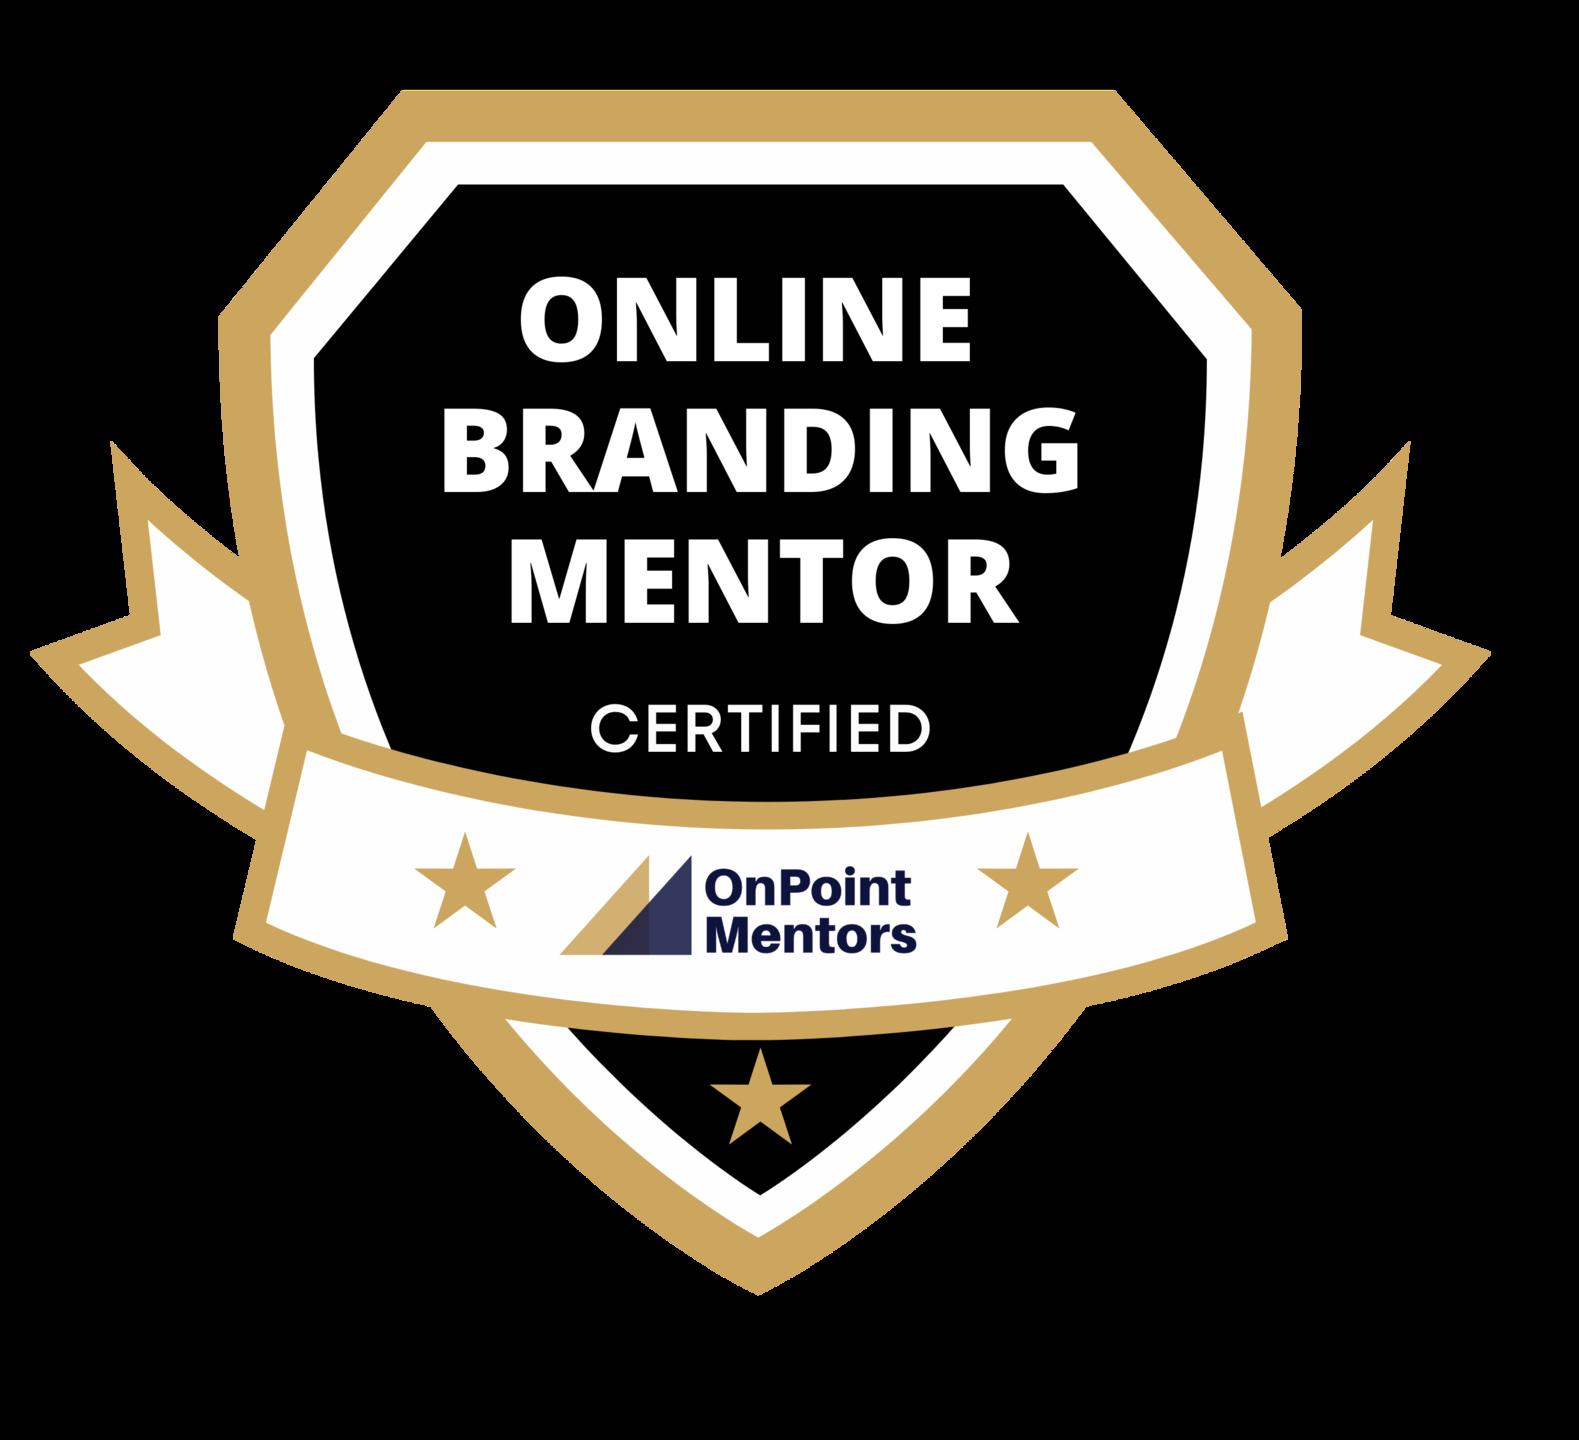 Online Branding Mentor